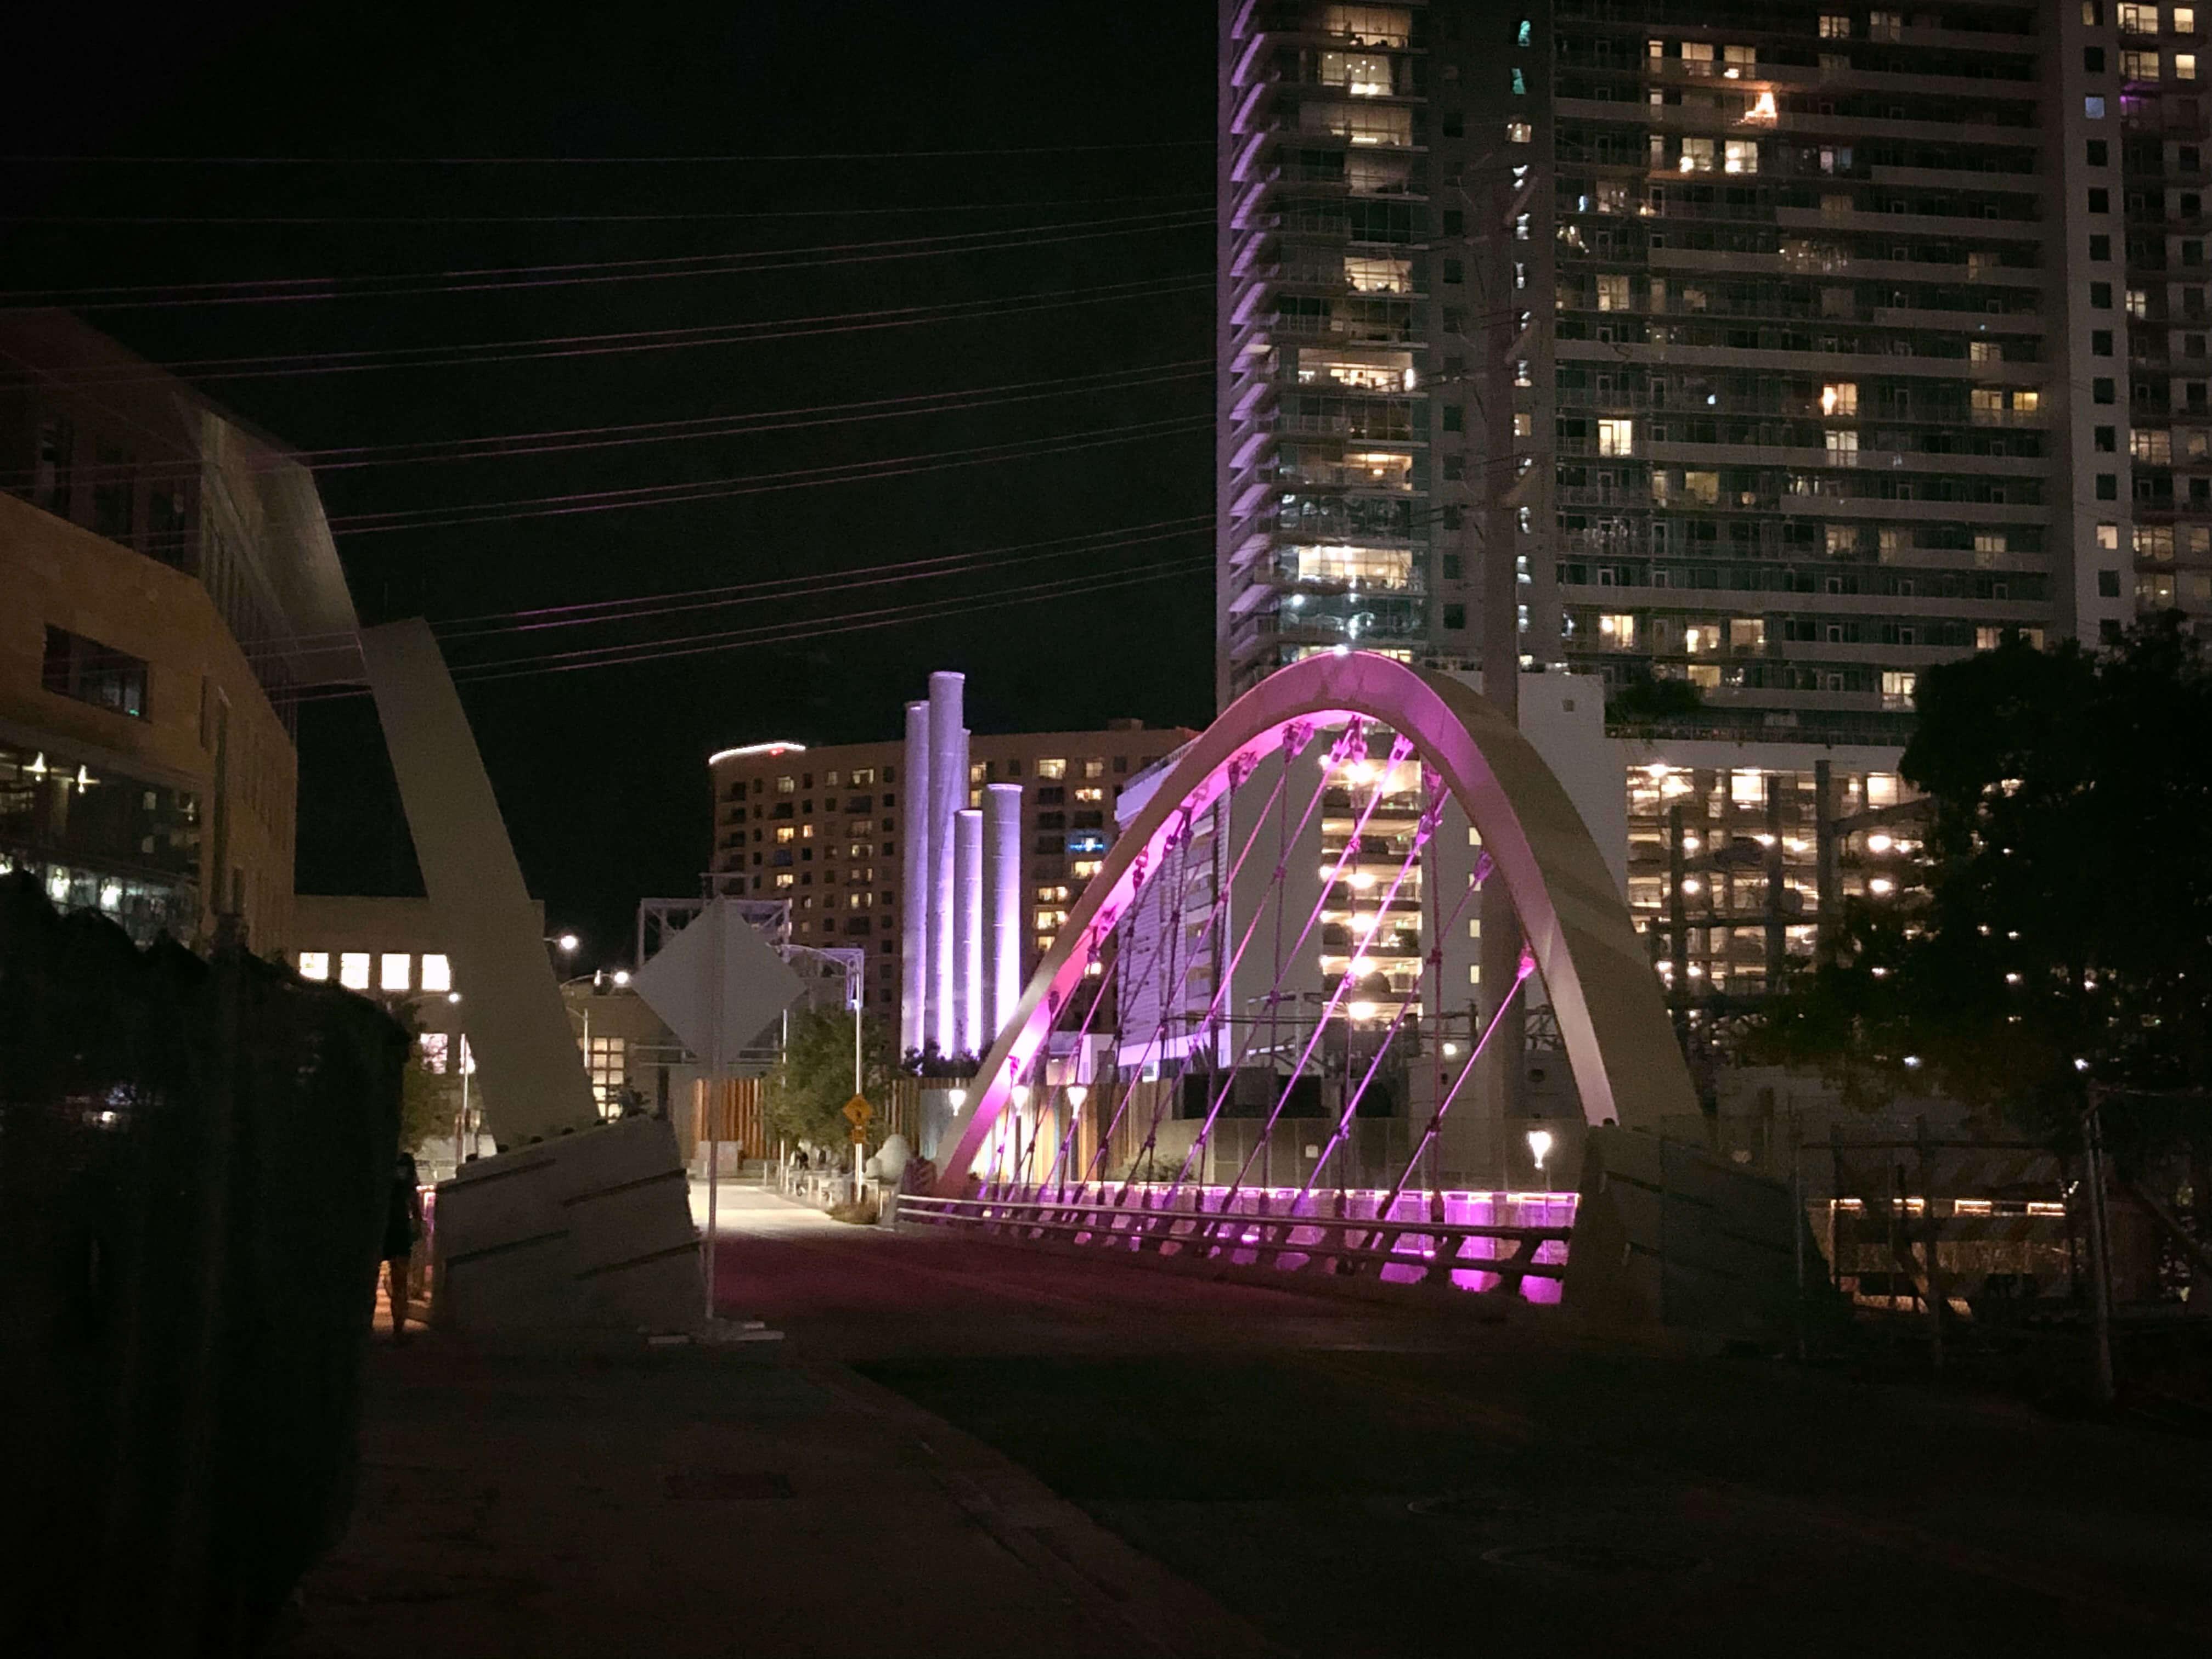 2nd Avenue Bridge in Austin, Texas